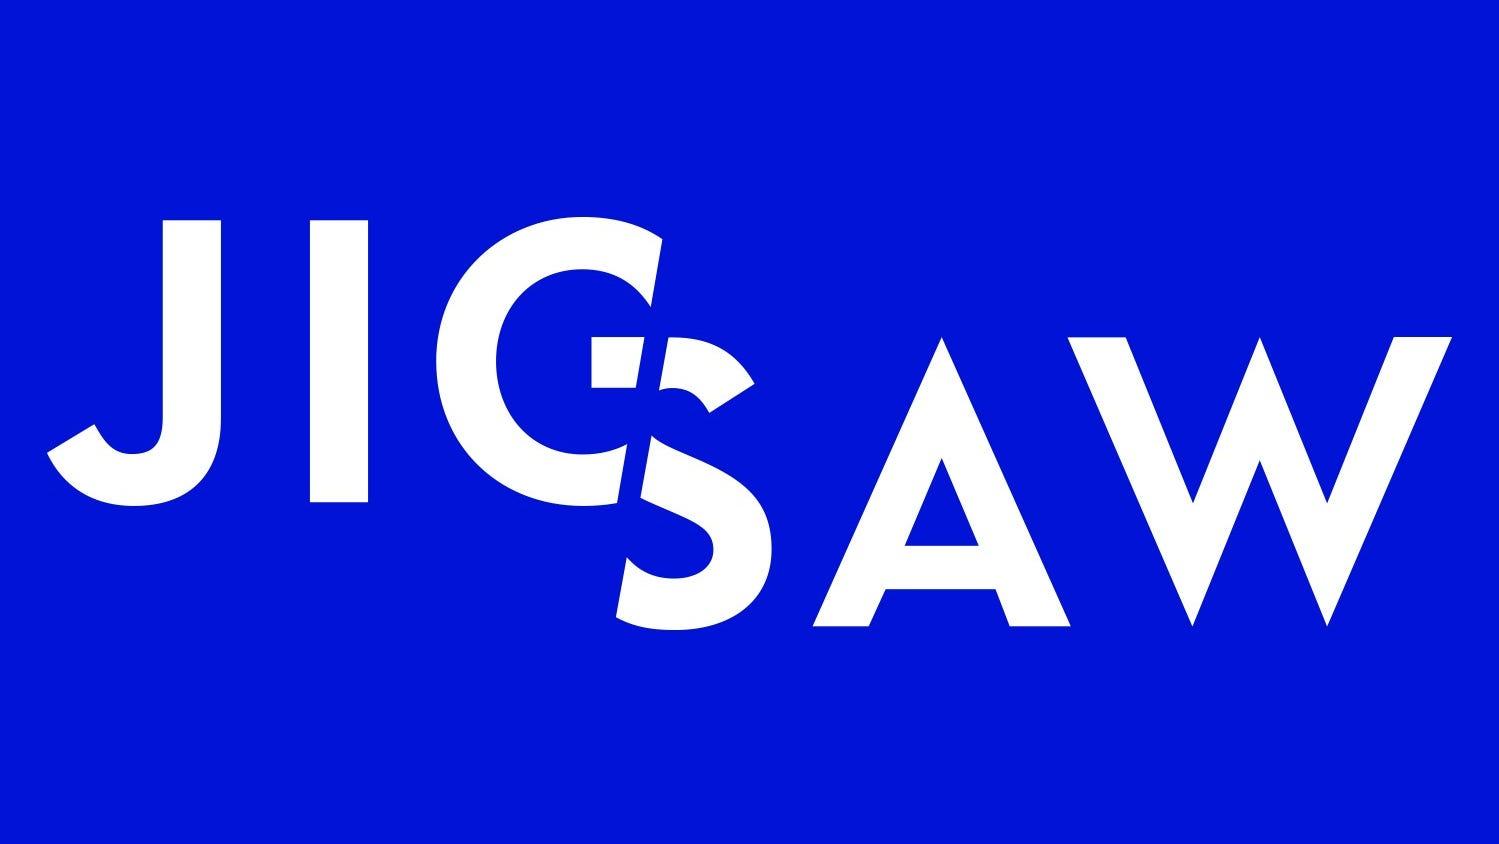 Nashville government and lobbying veterans launch Jigsaw